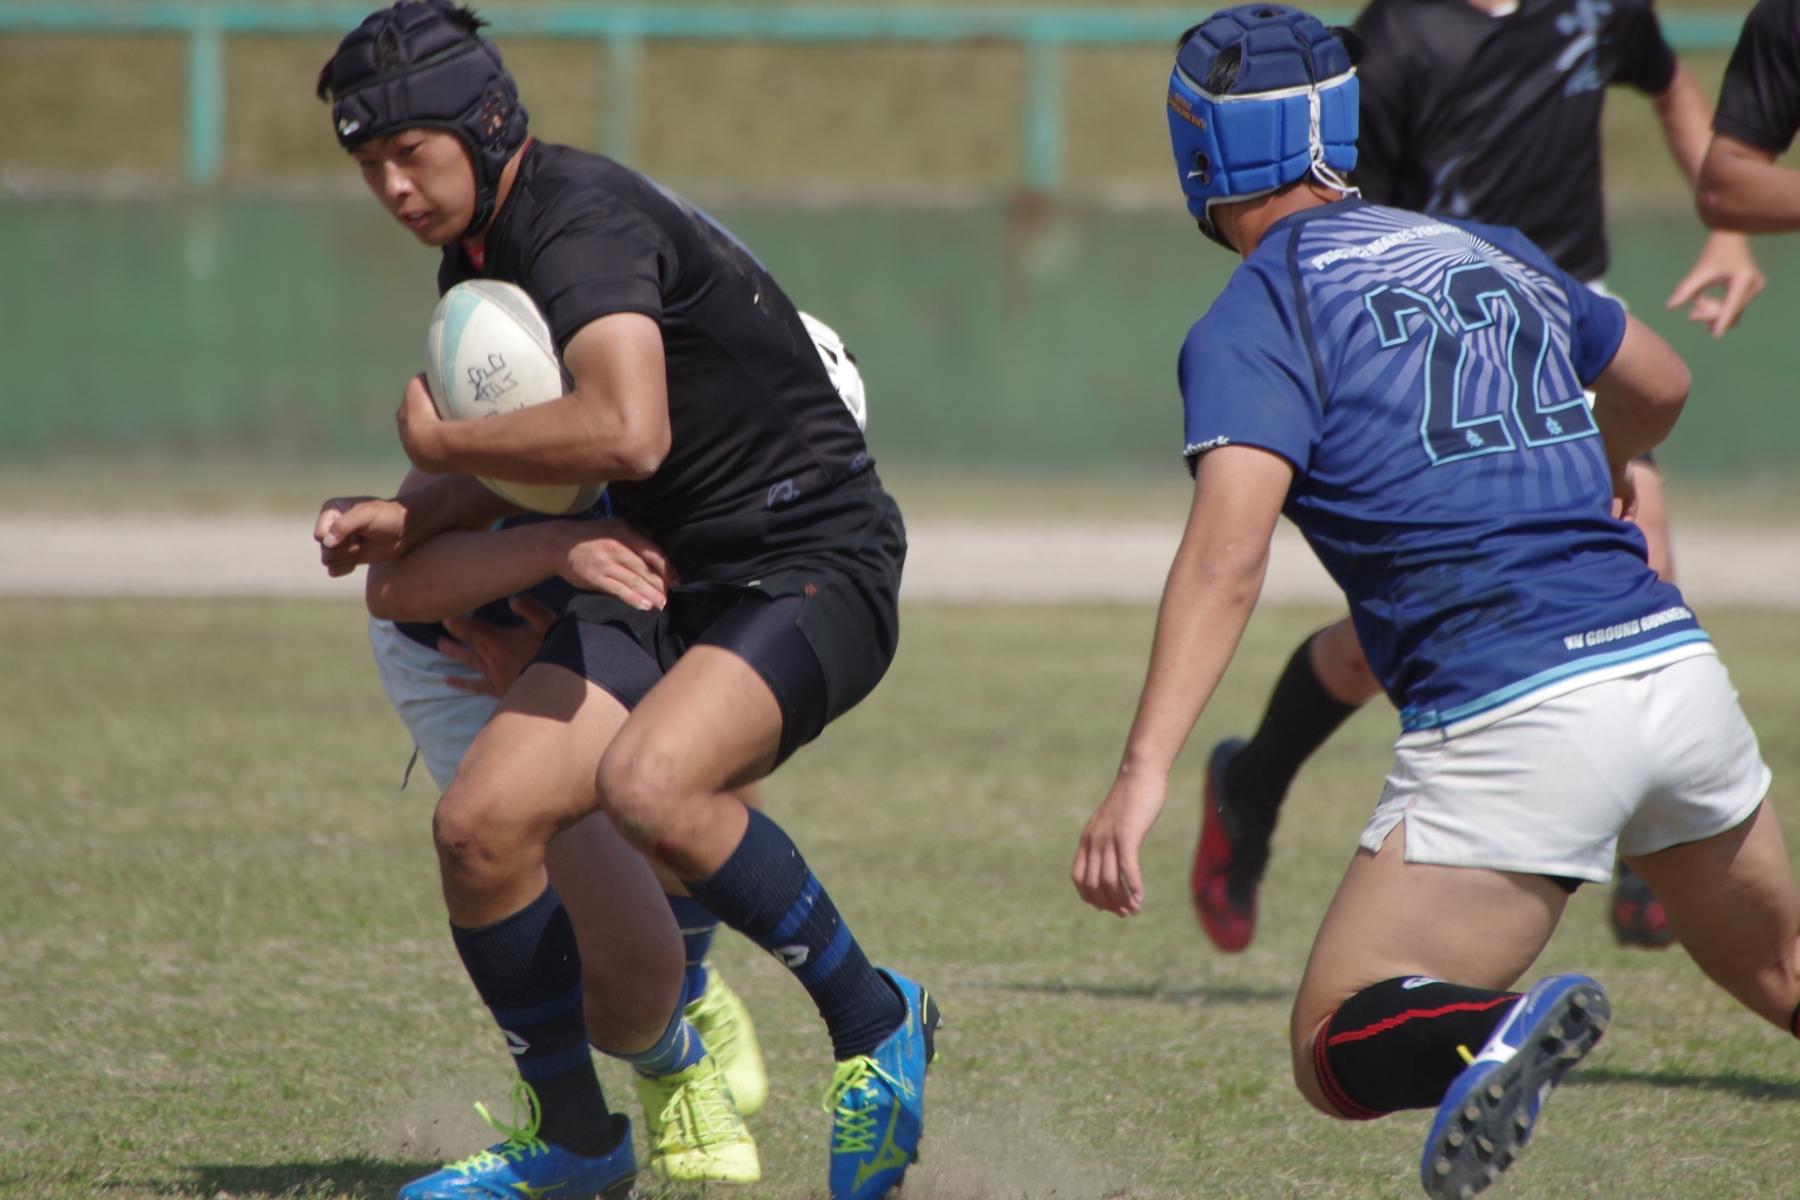 http://kokura-rugby.sakura.ne.jp/180428_150318.jpg